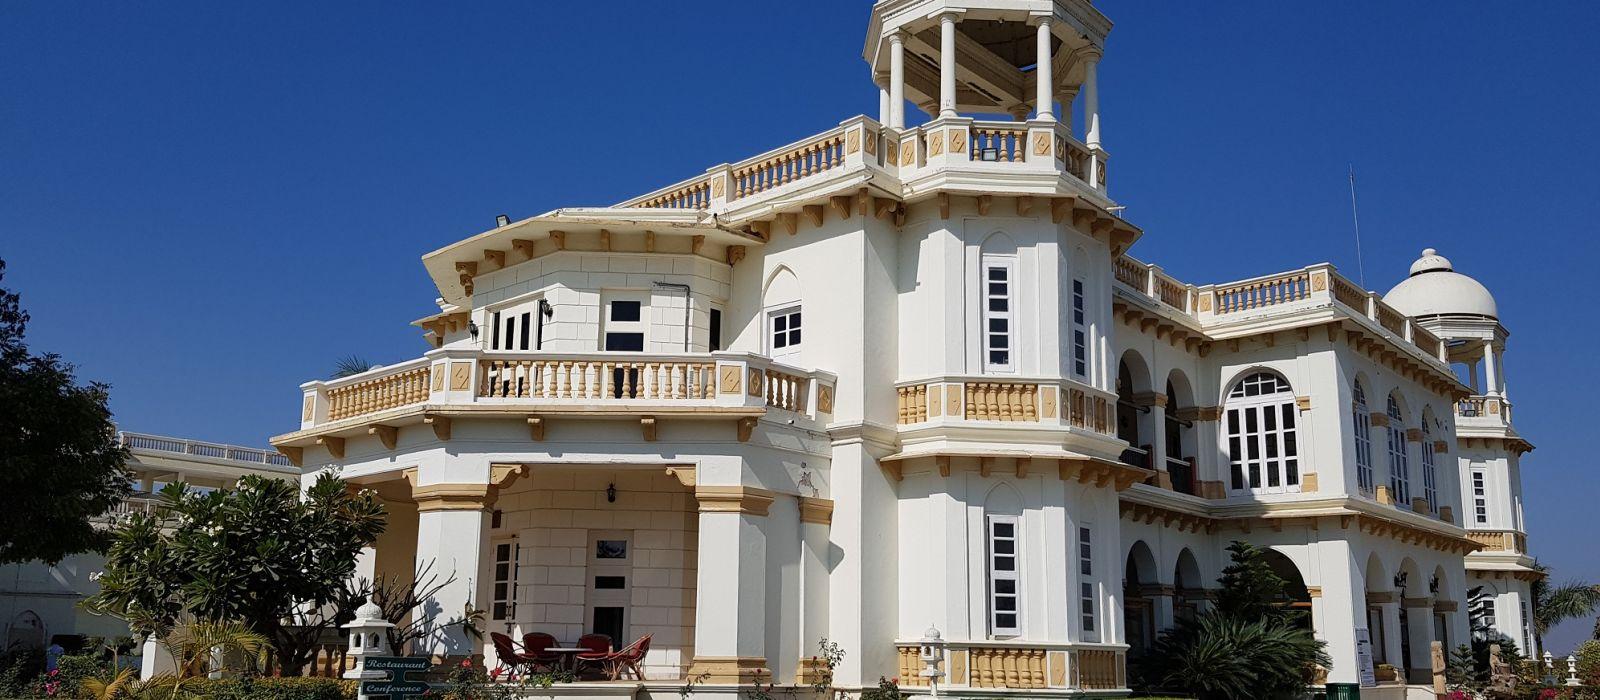 Destination Palanpur Central & West India